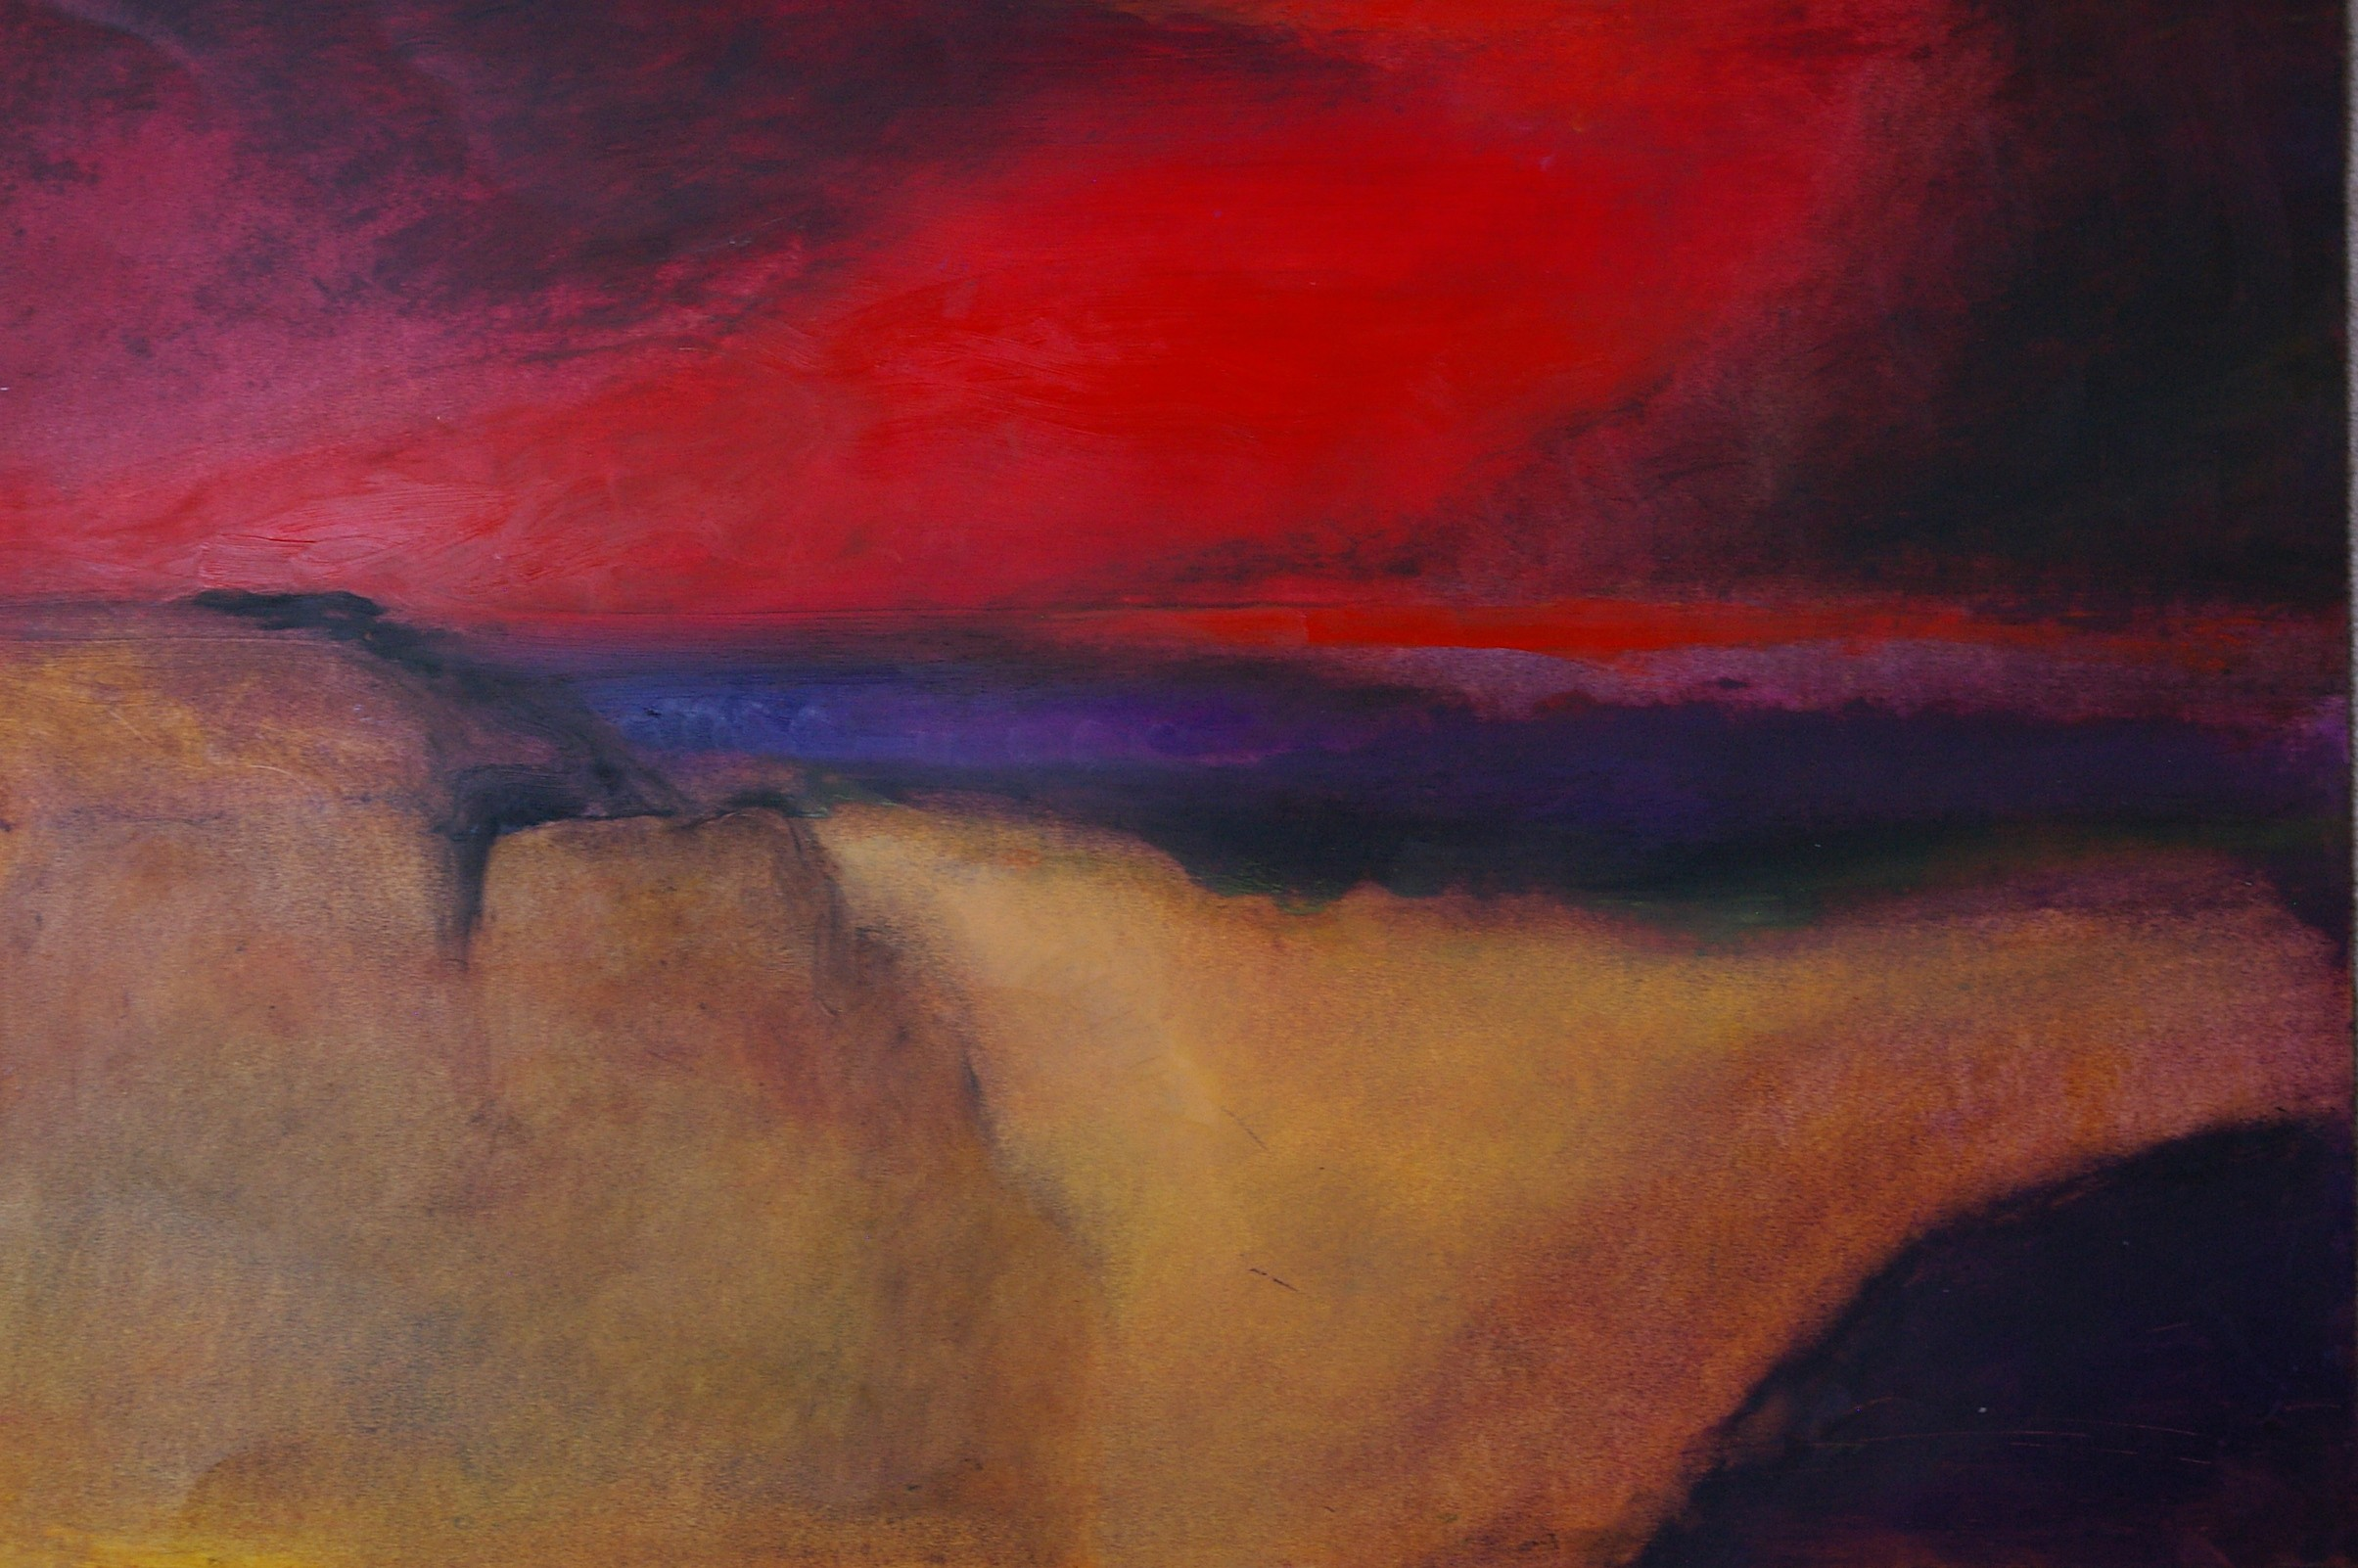 Impending Storm   42 x 60 cm   Oil on paper